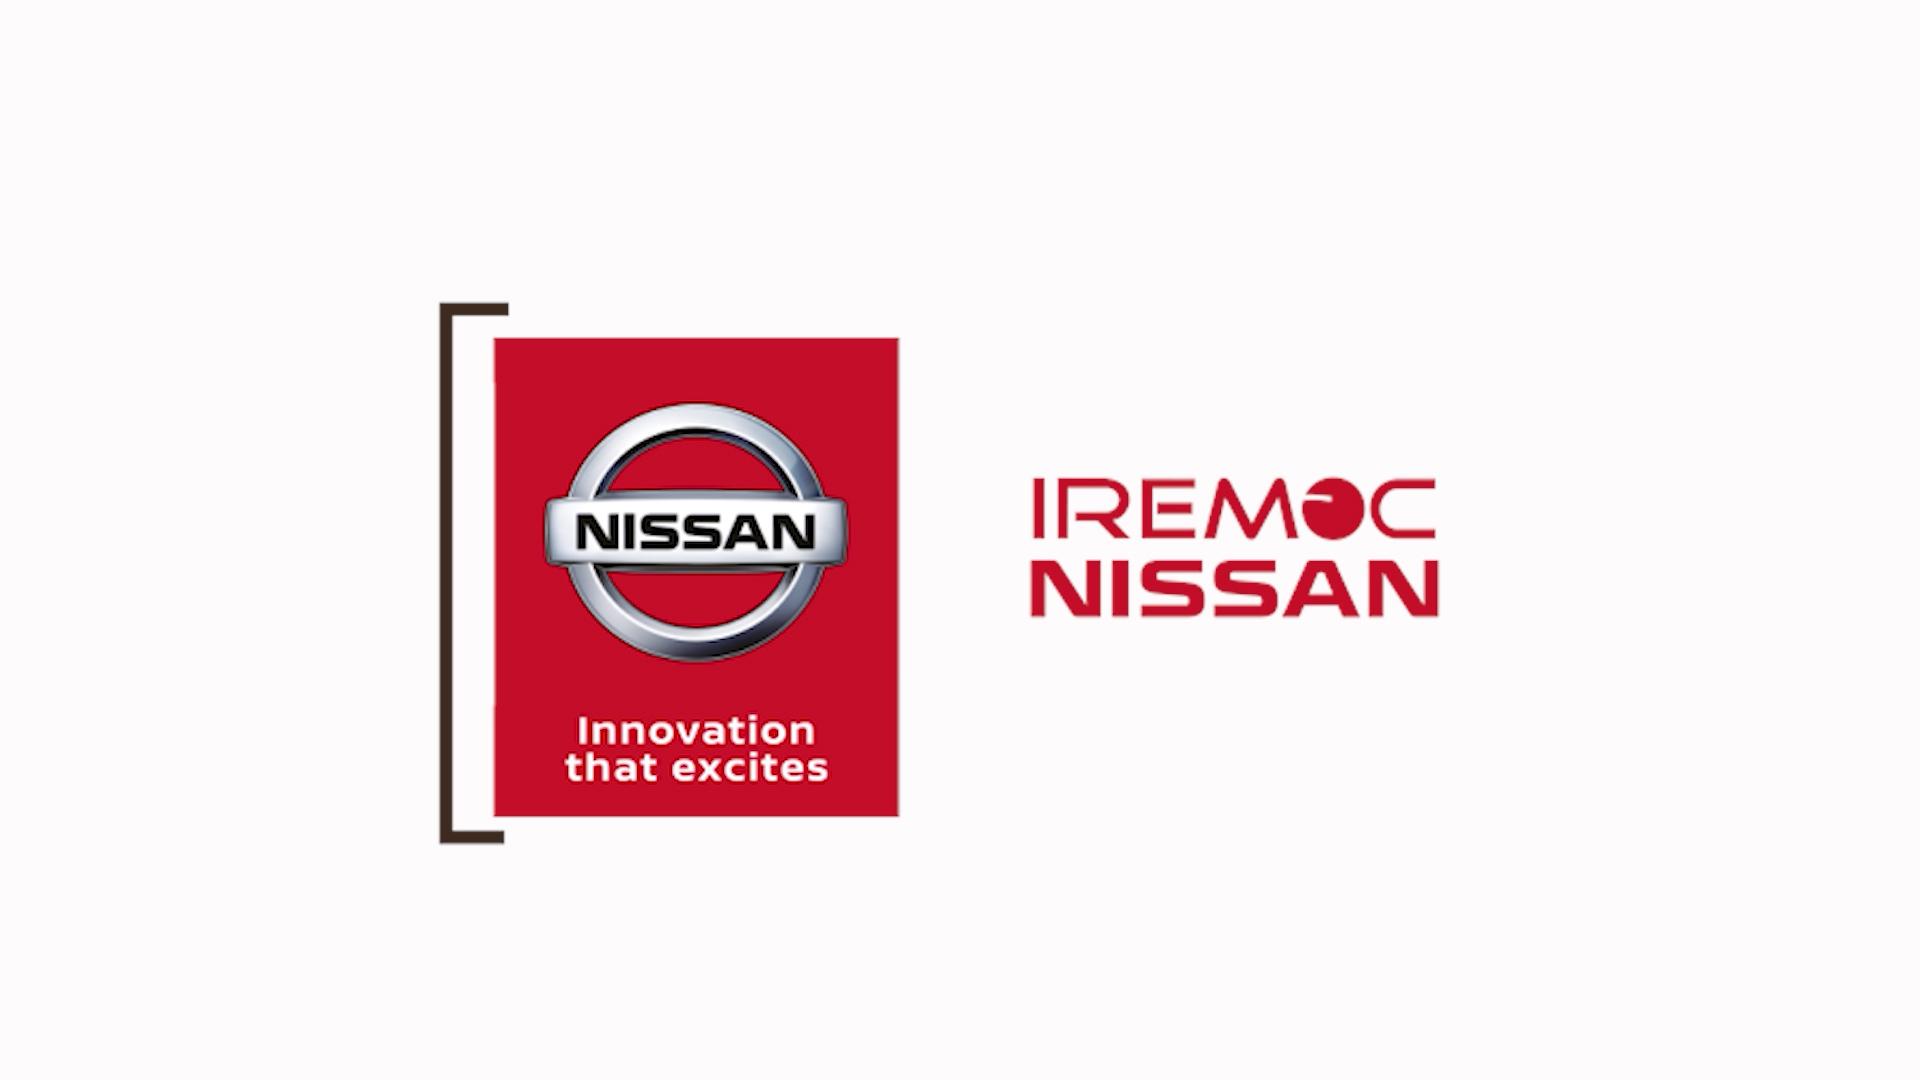 Nissan Iremoc Medidas de Segurança